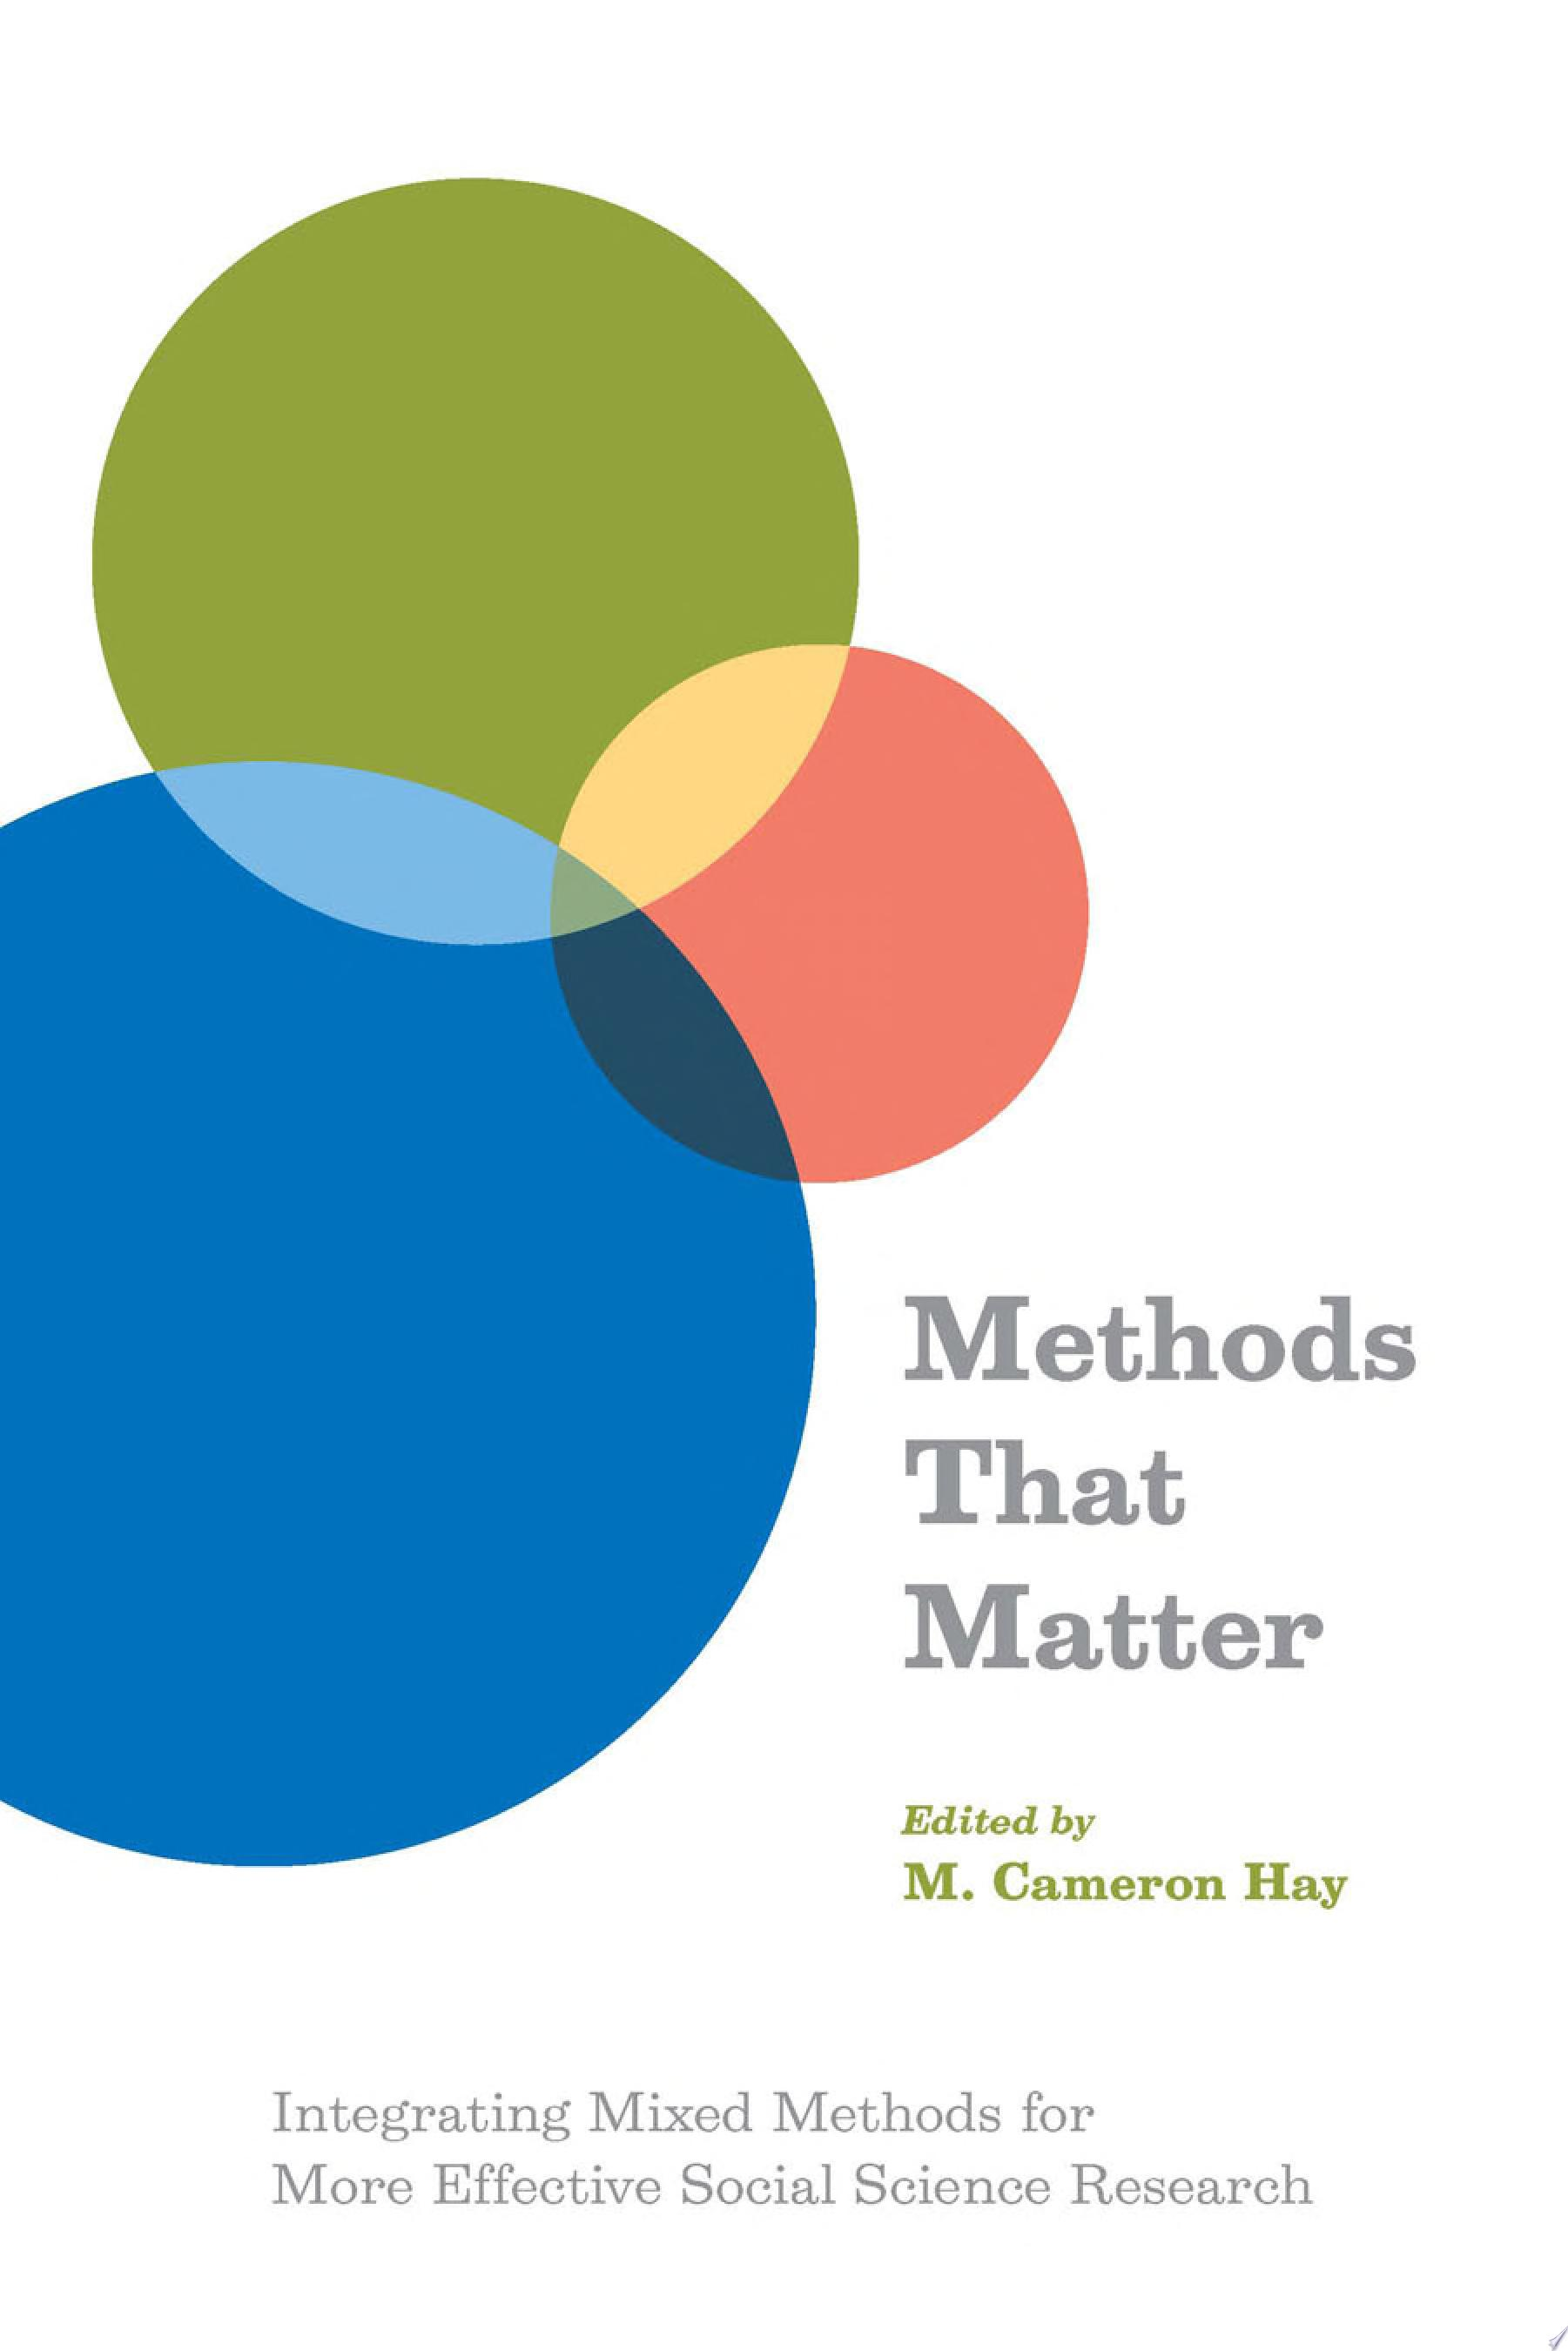 Methods That Matter